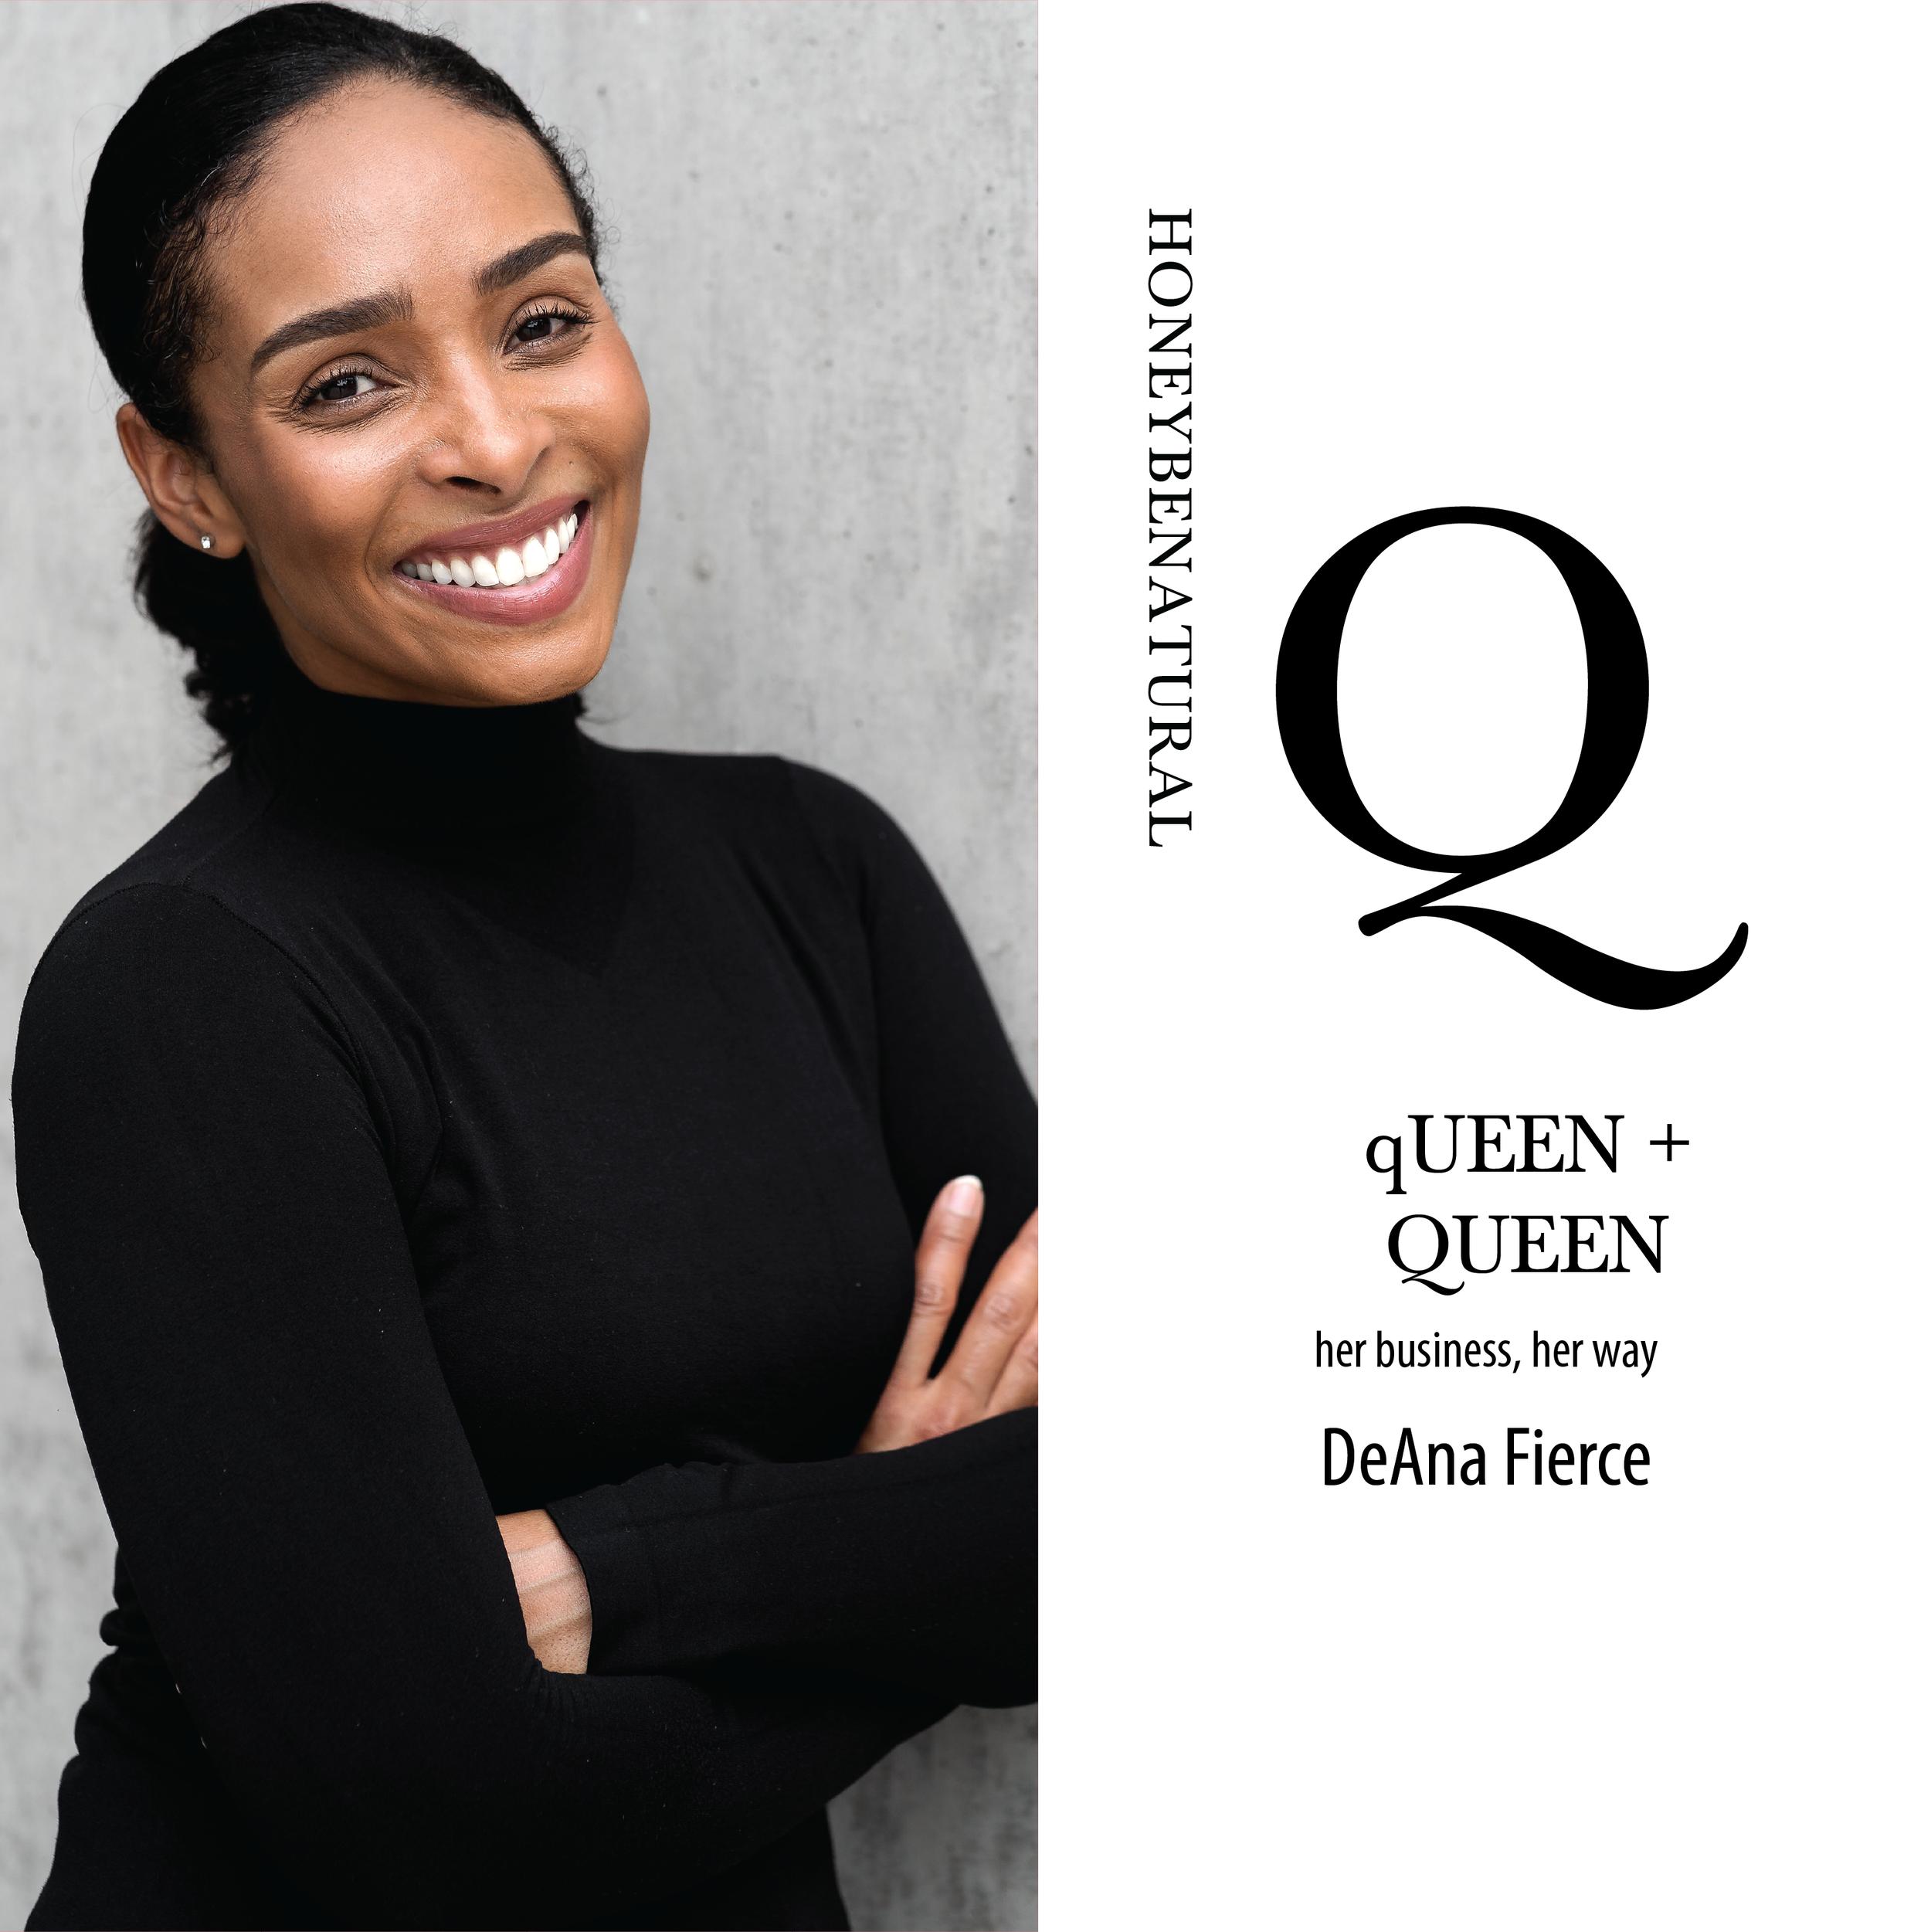 QueenPlusQueen_may 2019_DeAna Fierce_Title-01-01.png